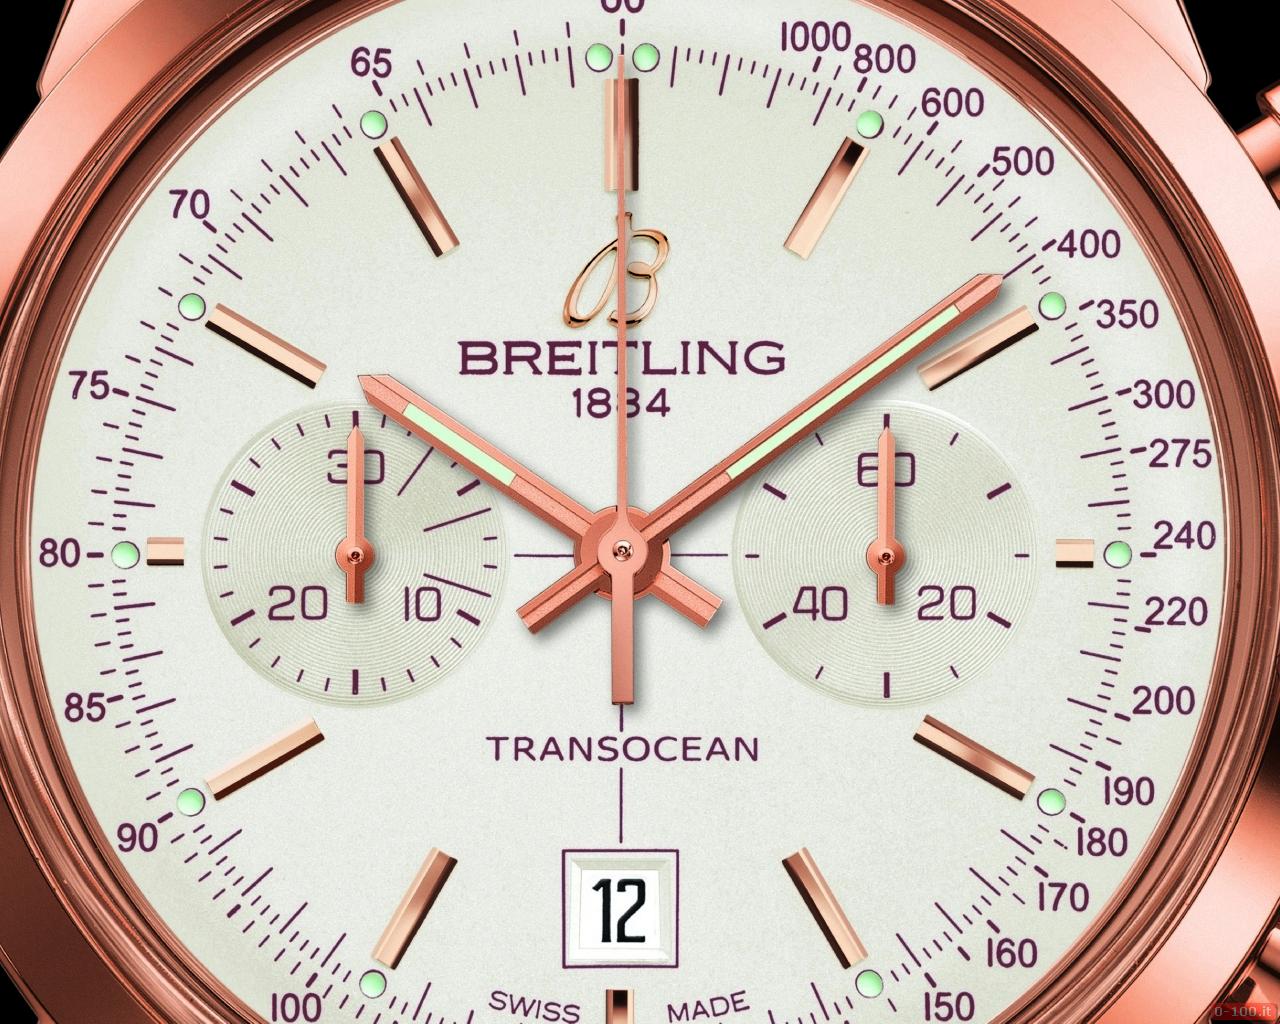 baselworld-2013-breitling-transocean-chronograph-38_0-100 2